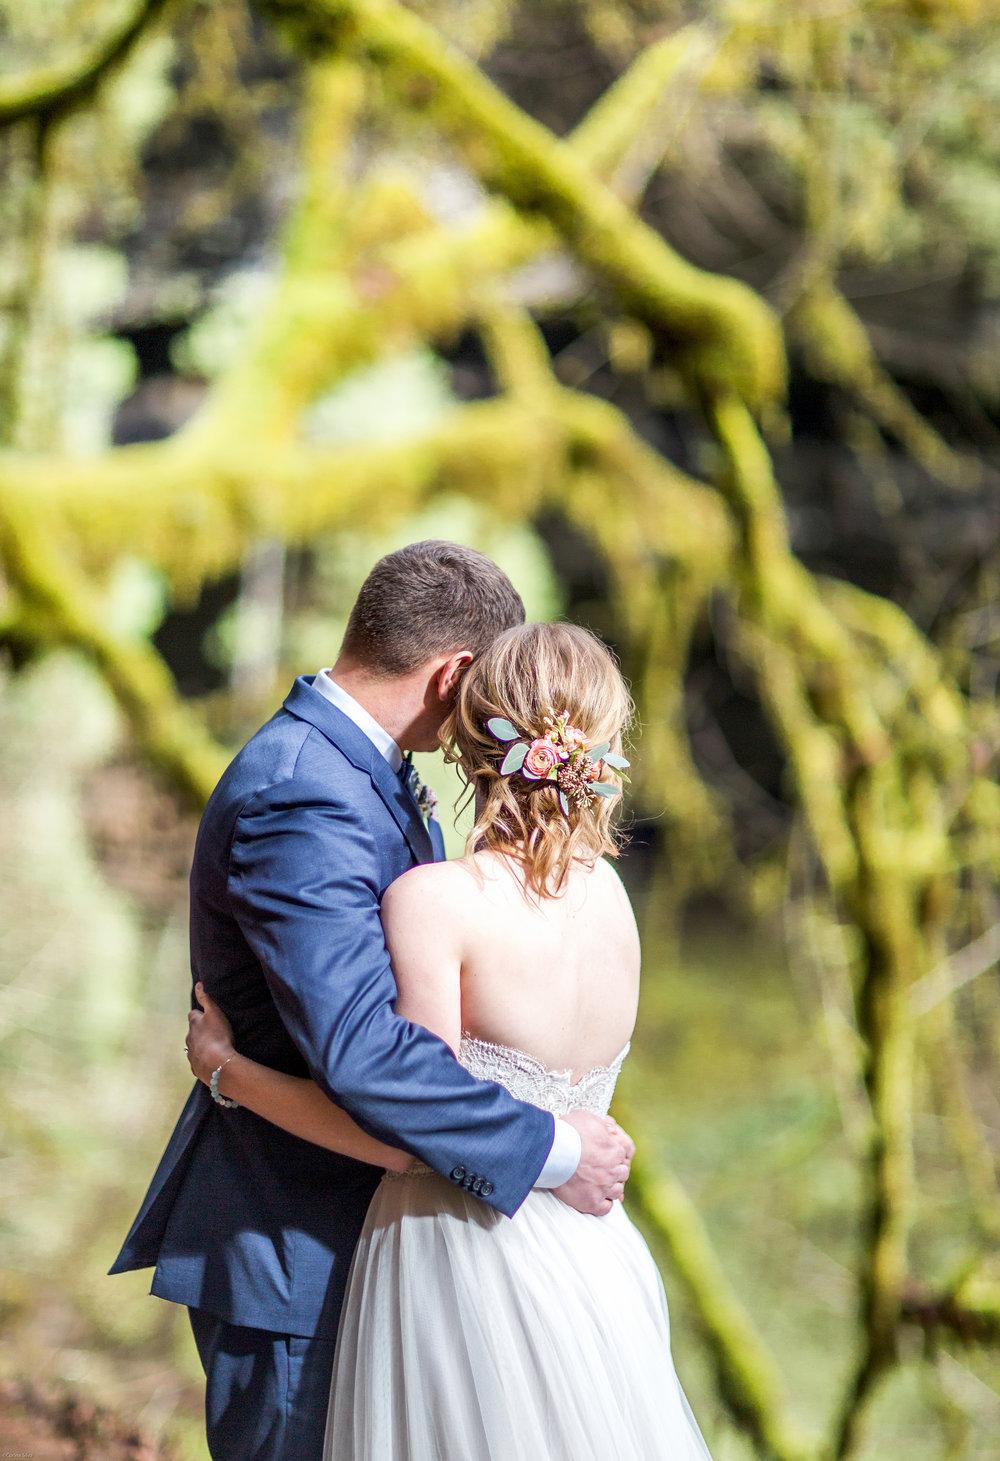 Silver Falls-elopement-bride-and-groom-photo Corina Silva Studios-63.jpg